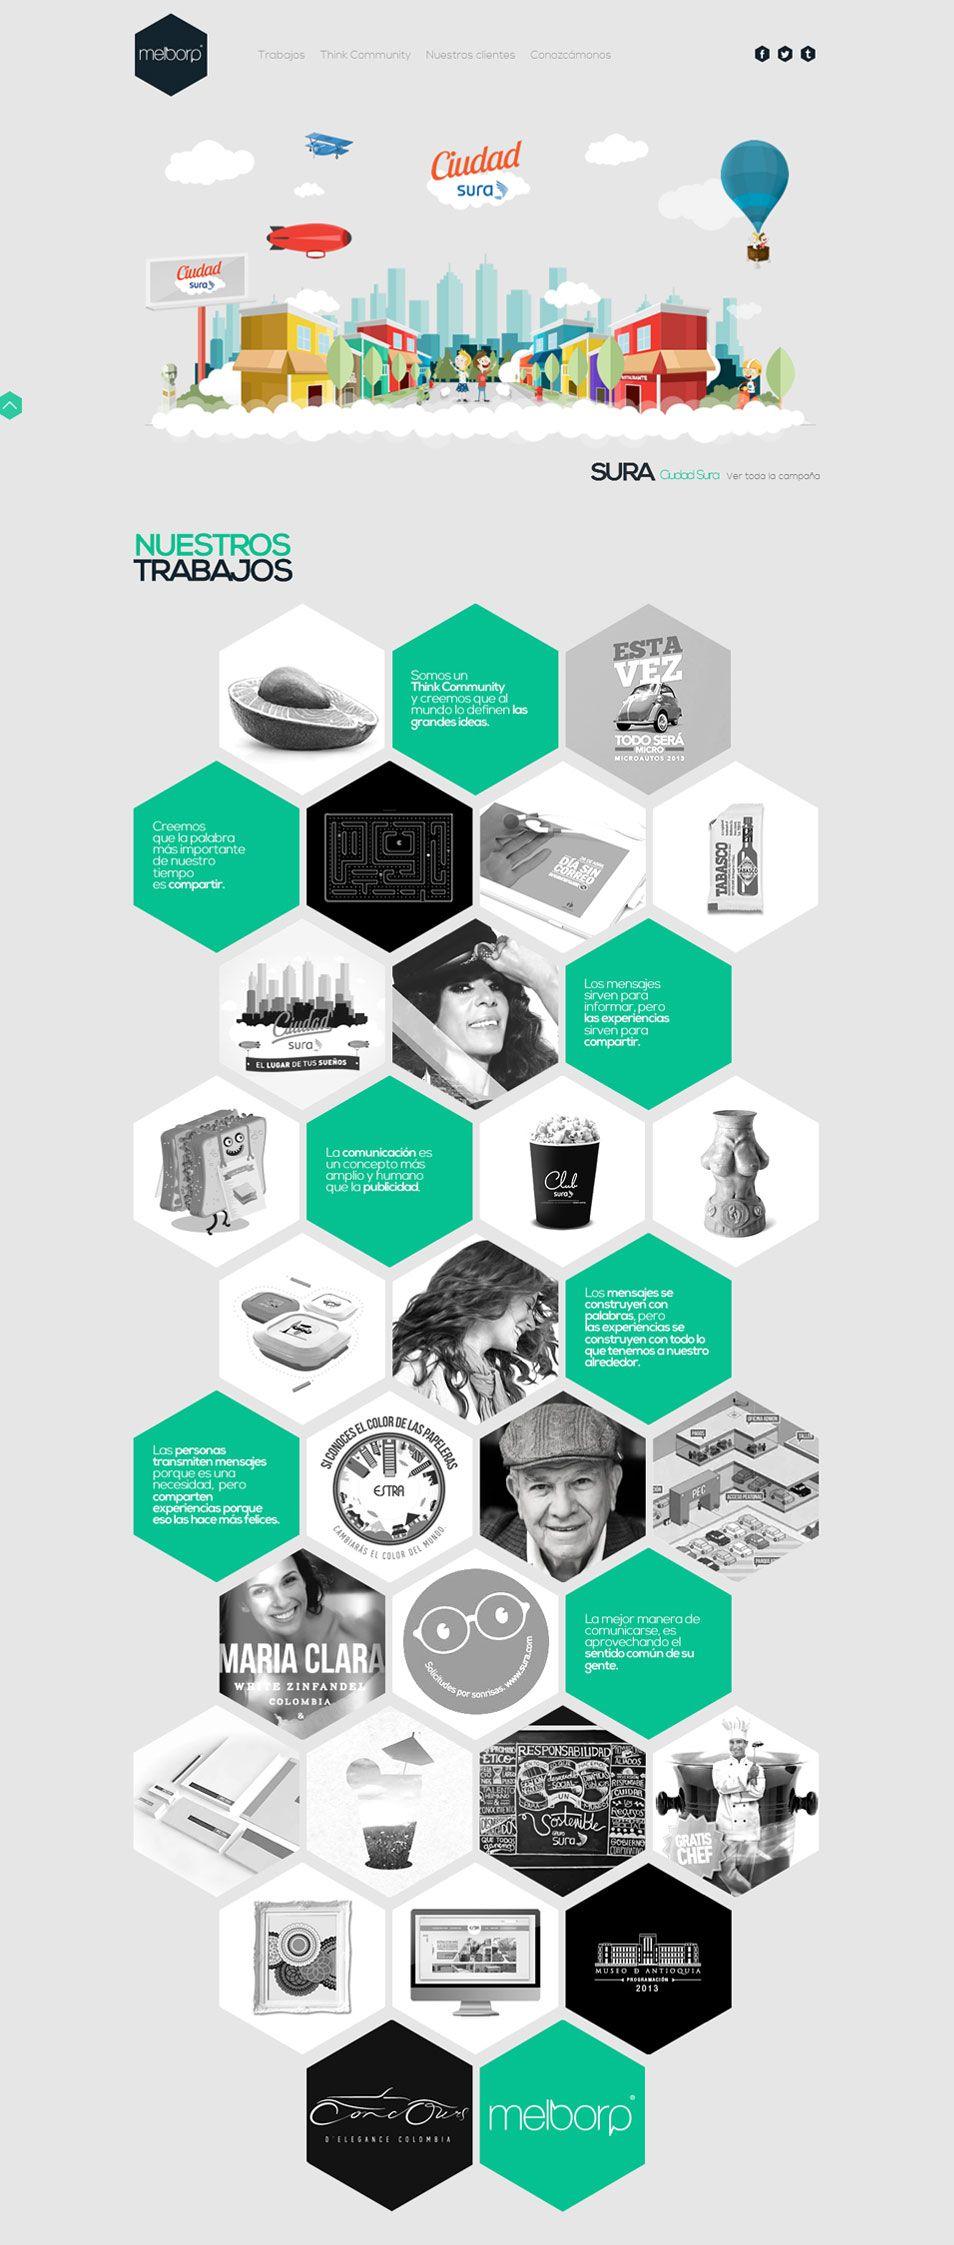 malborp #webdesign | COOL | Pinterest | Web design inspiration, Web ...